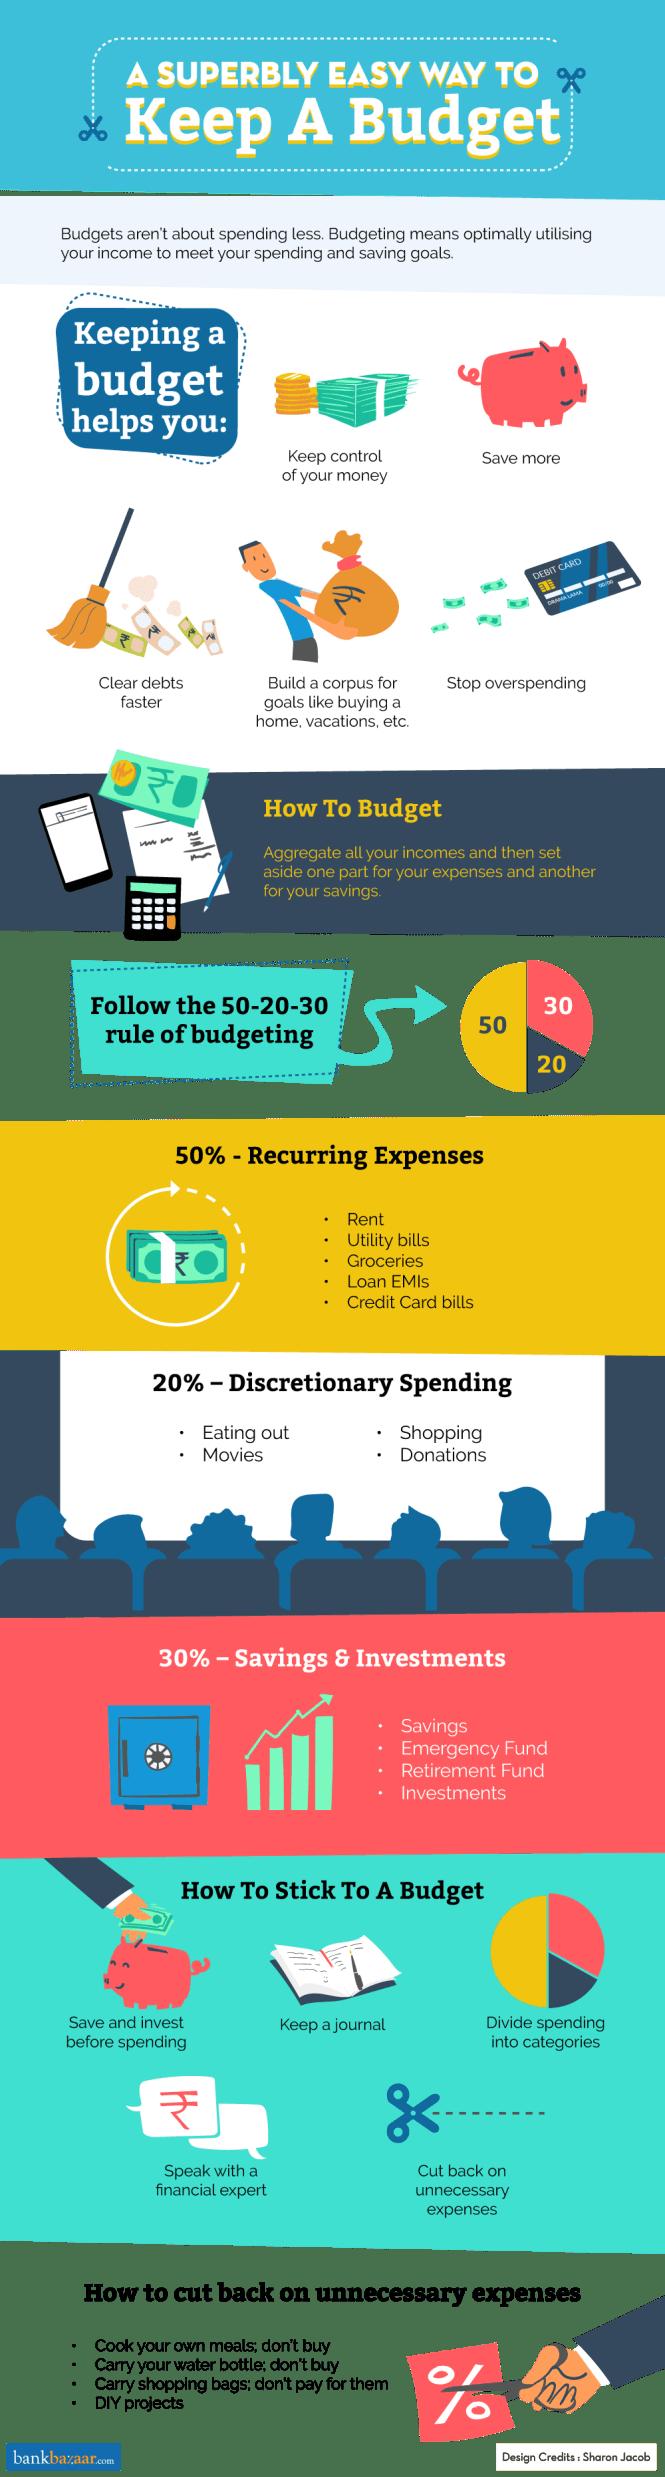 A Superbly Easy Way To Keep A Budget